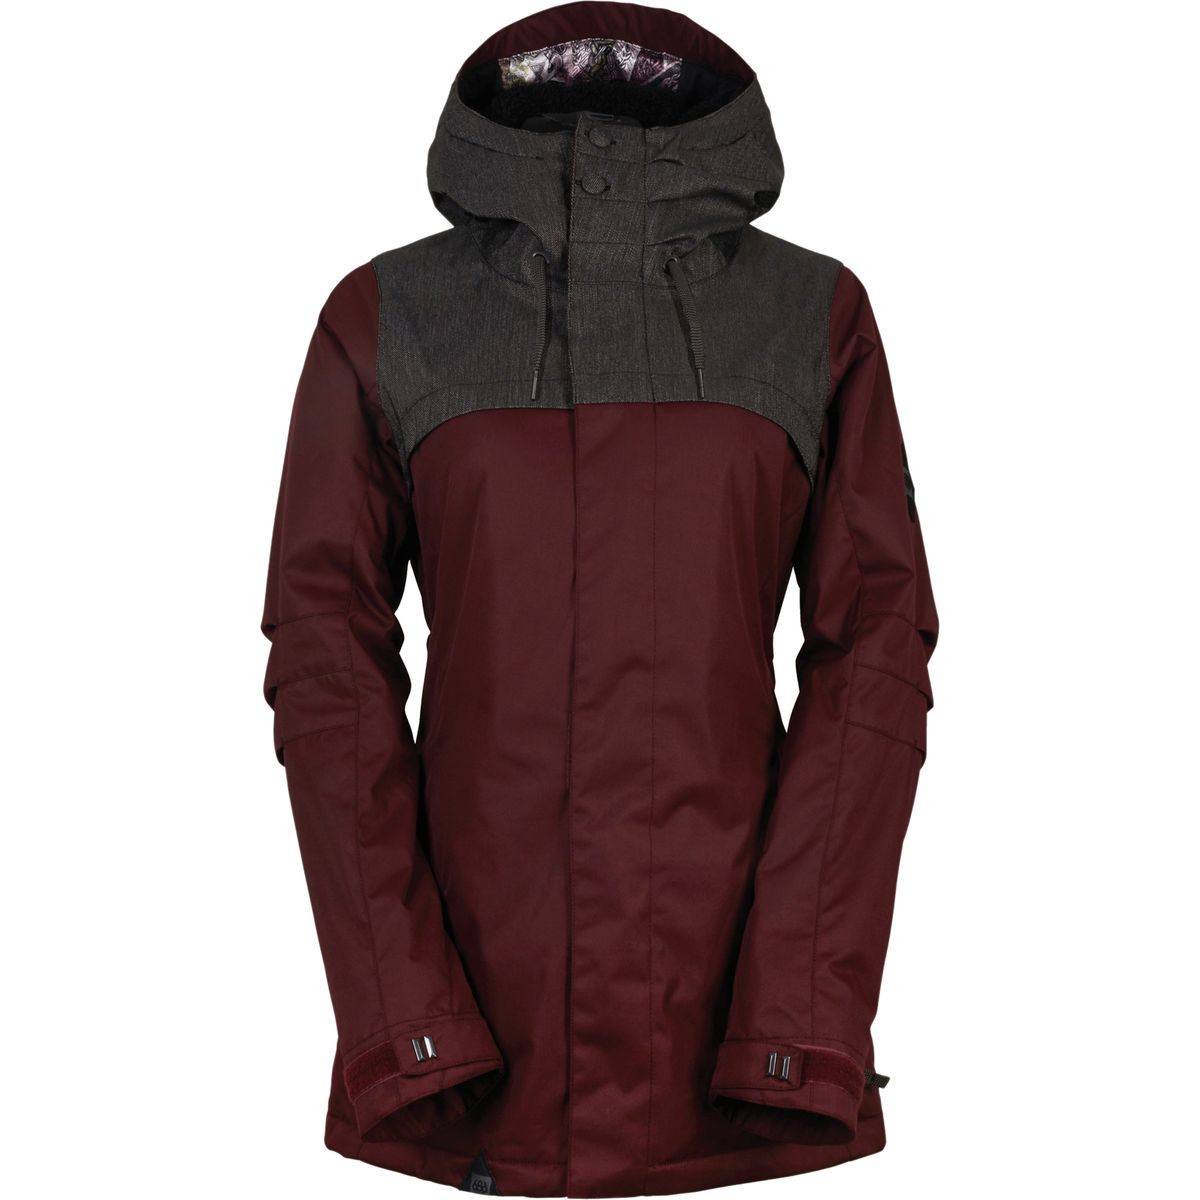 686 Parklan Mystique Insulated Jacket - Women